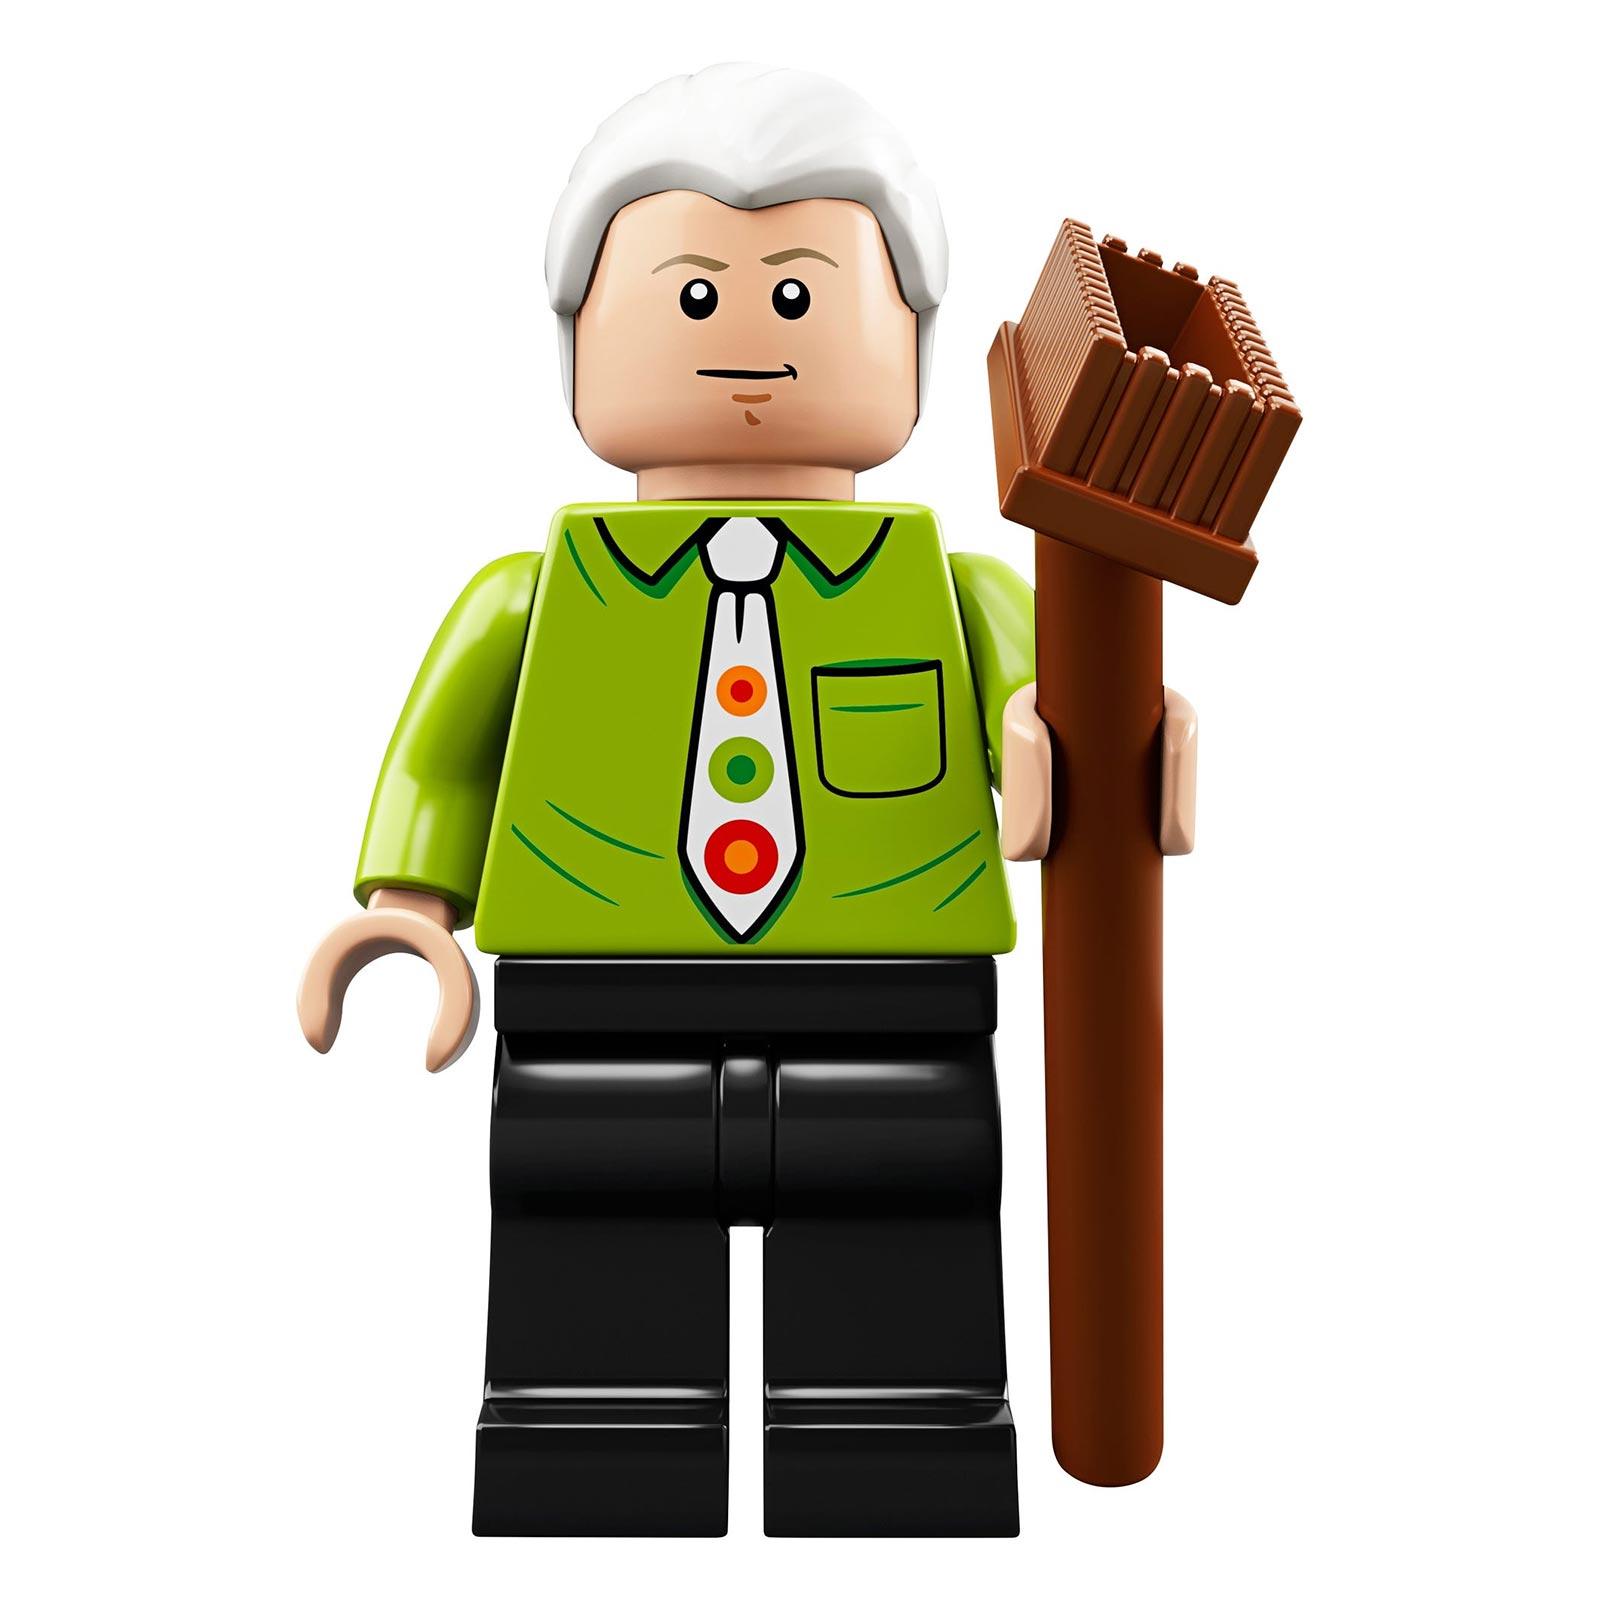 LEGO Friends Gunther Minifigure